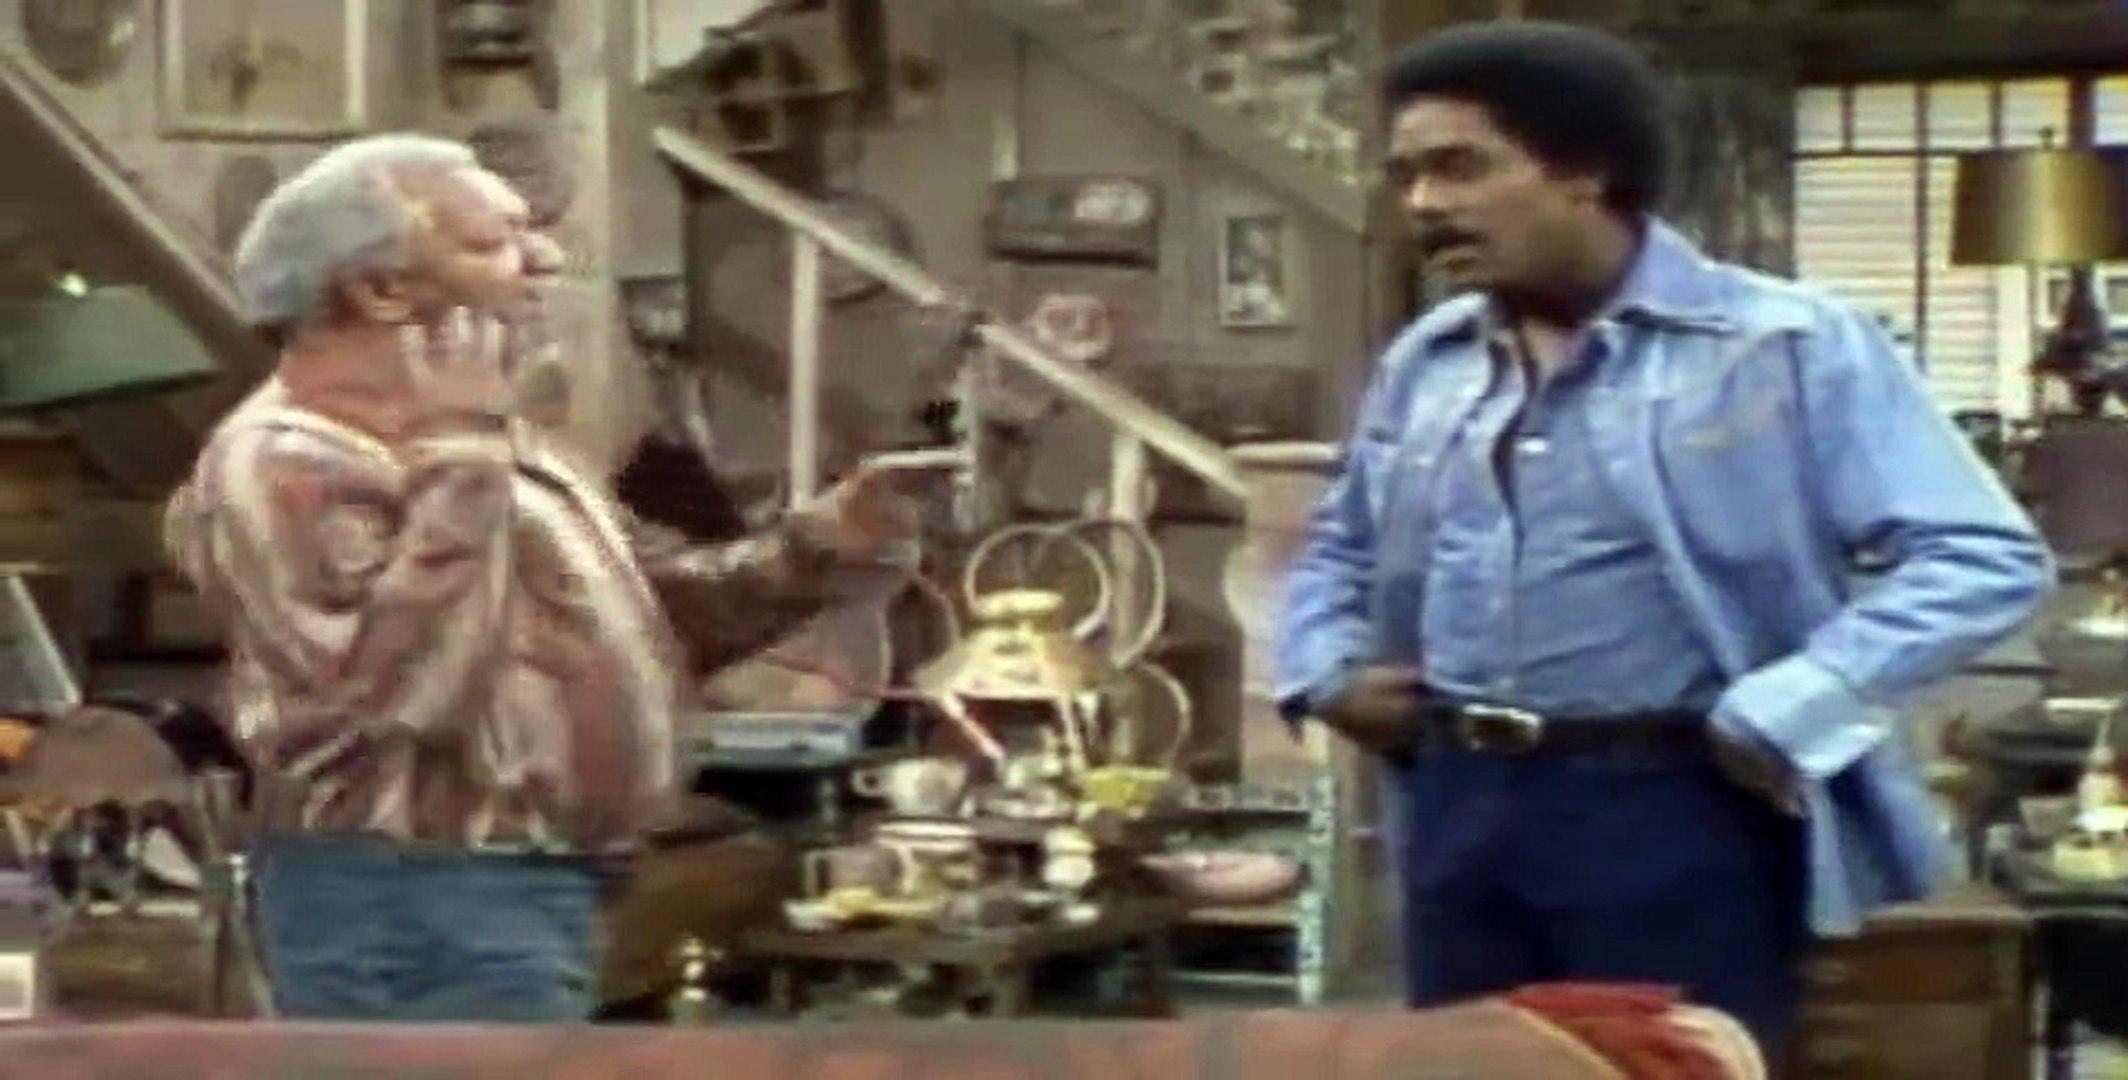 Sanford and Son S04 - Ep19 Golden Boy HD Watch